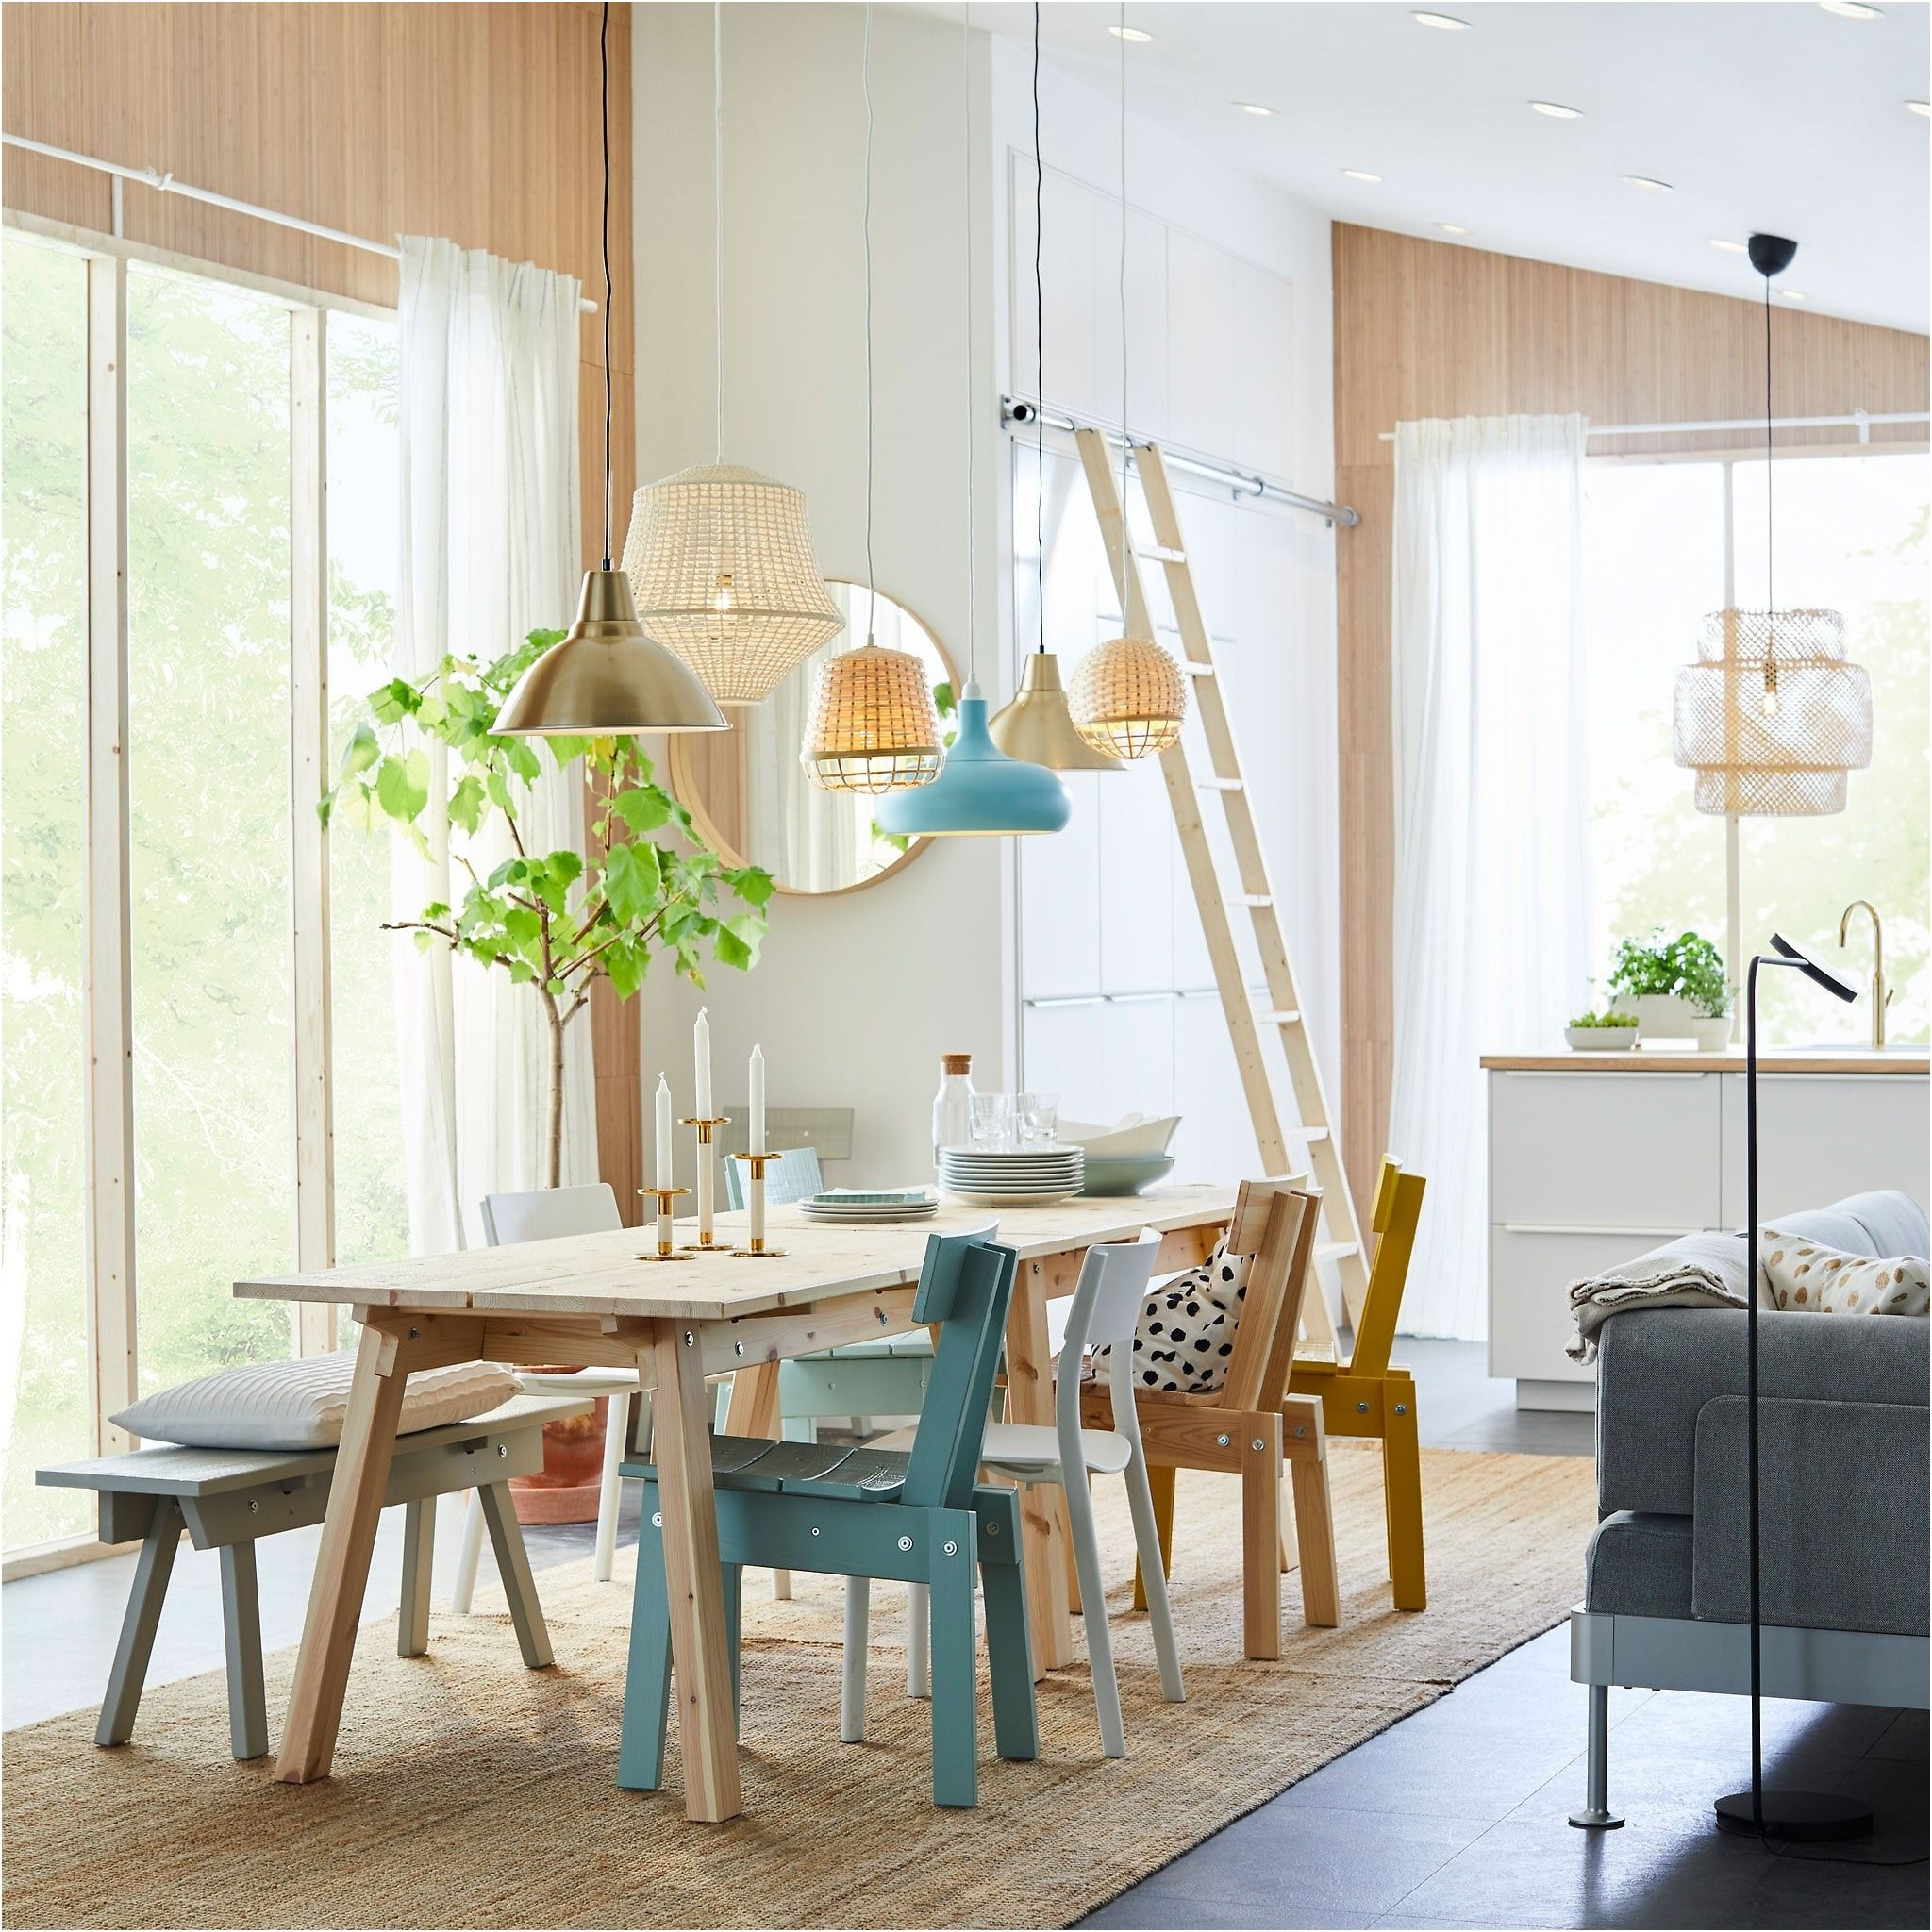 8 Joyeux Table De Salle A Manger Ikea Pics